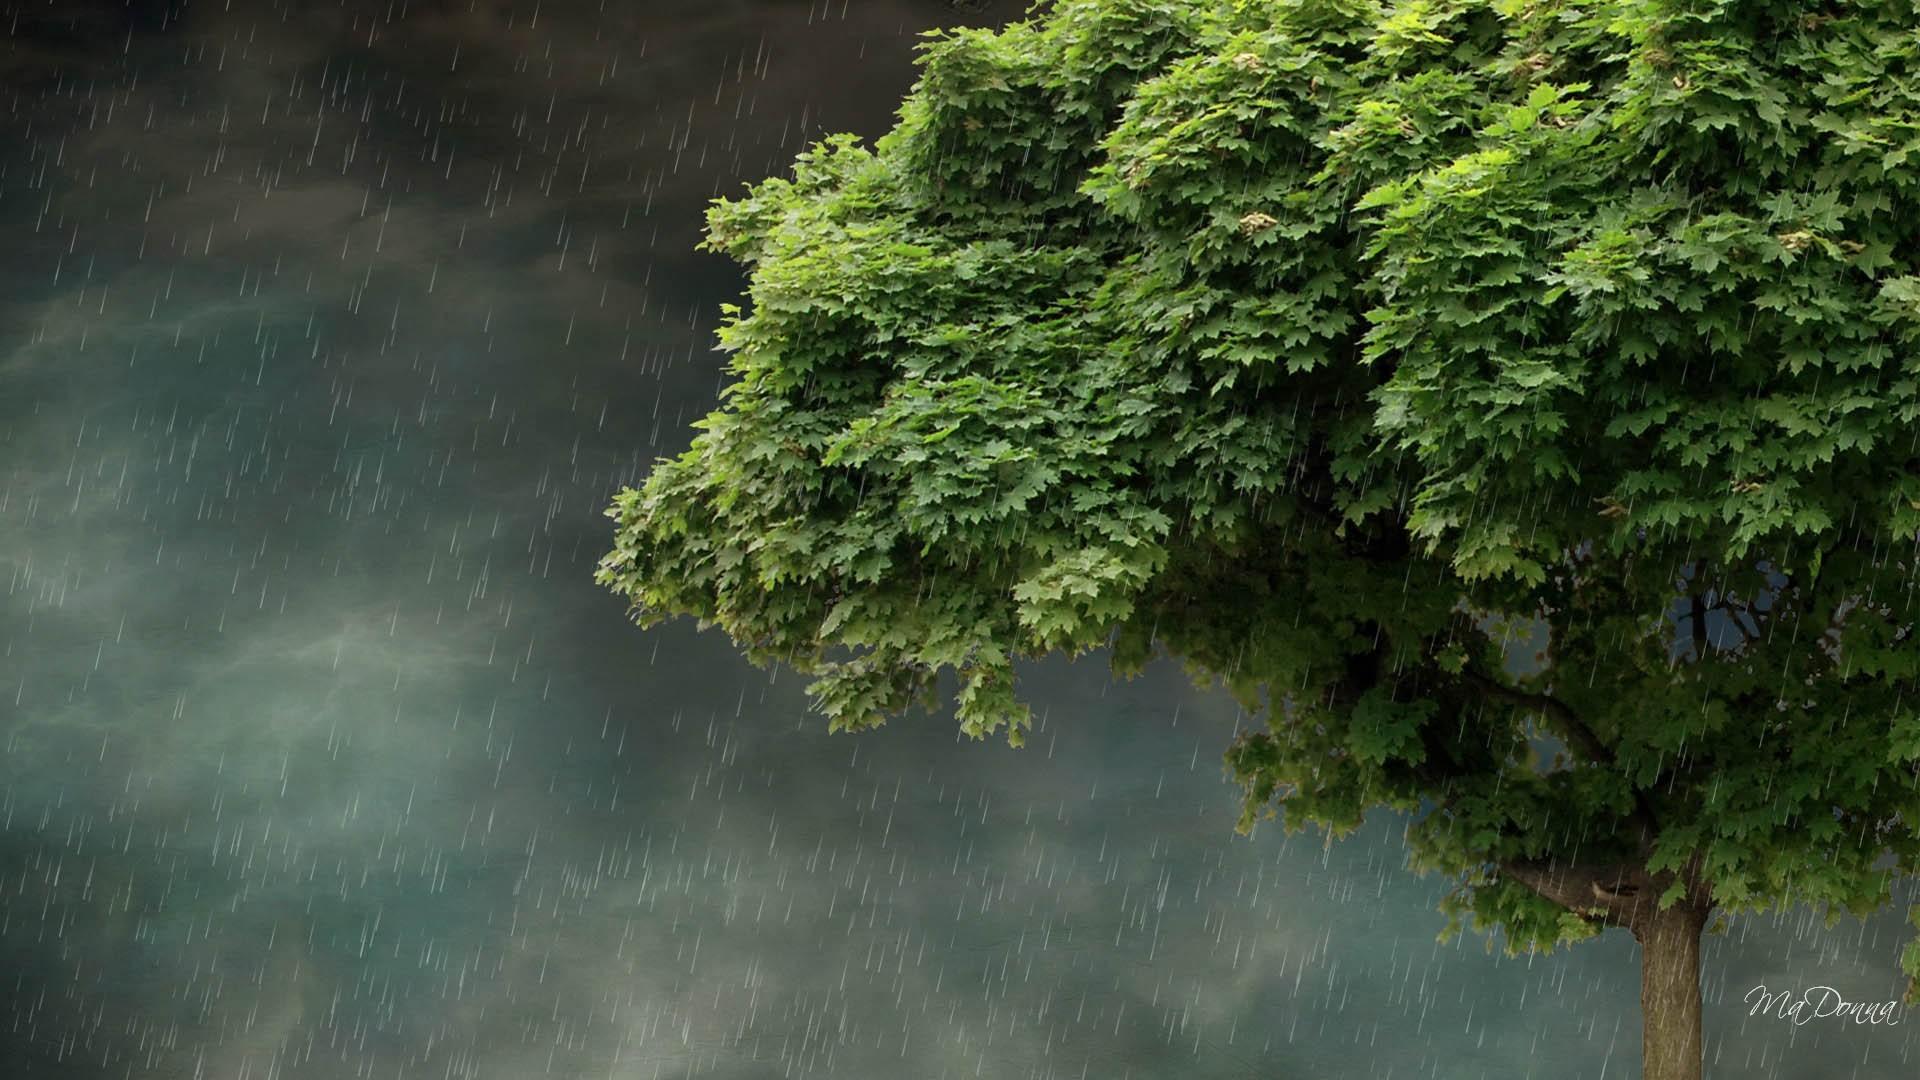 Beautiful rainy landscapes wallpapers hd 2018 wallpapertag - Top hd wallpapers 2018 ...